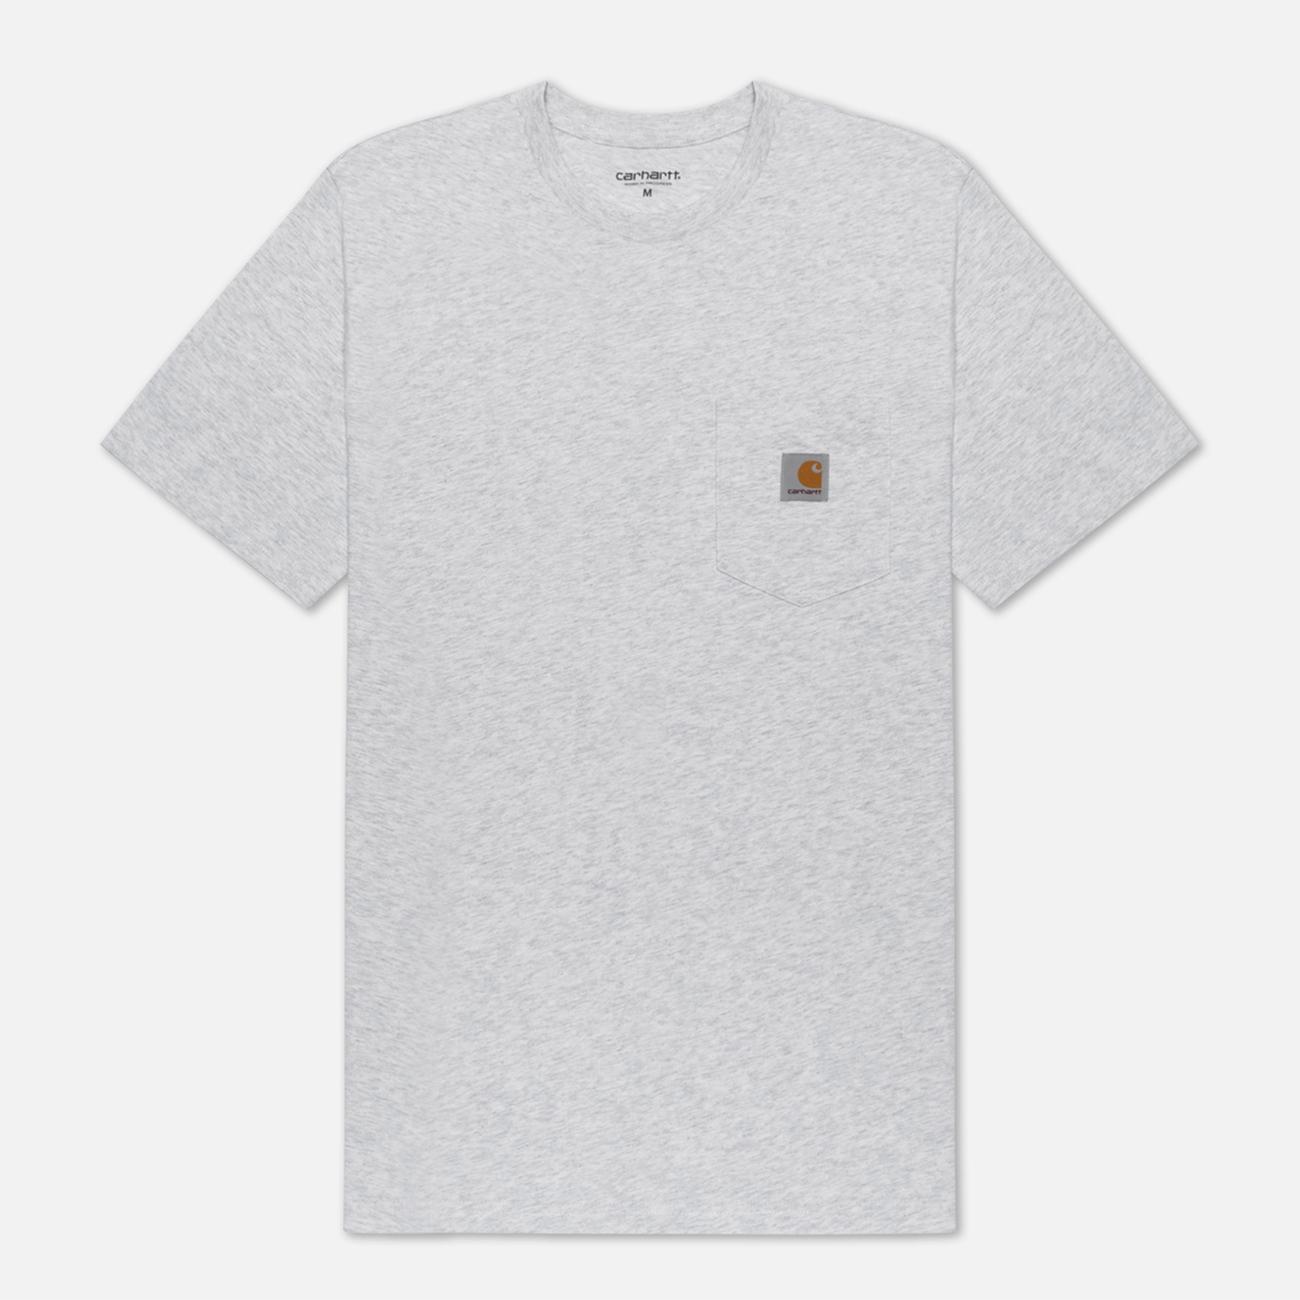 Мужская футболка Carhartt WIP S/S Pocket Ash Heather